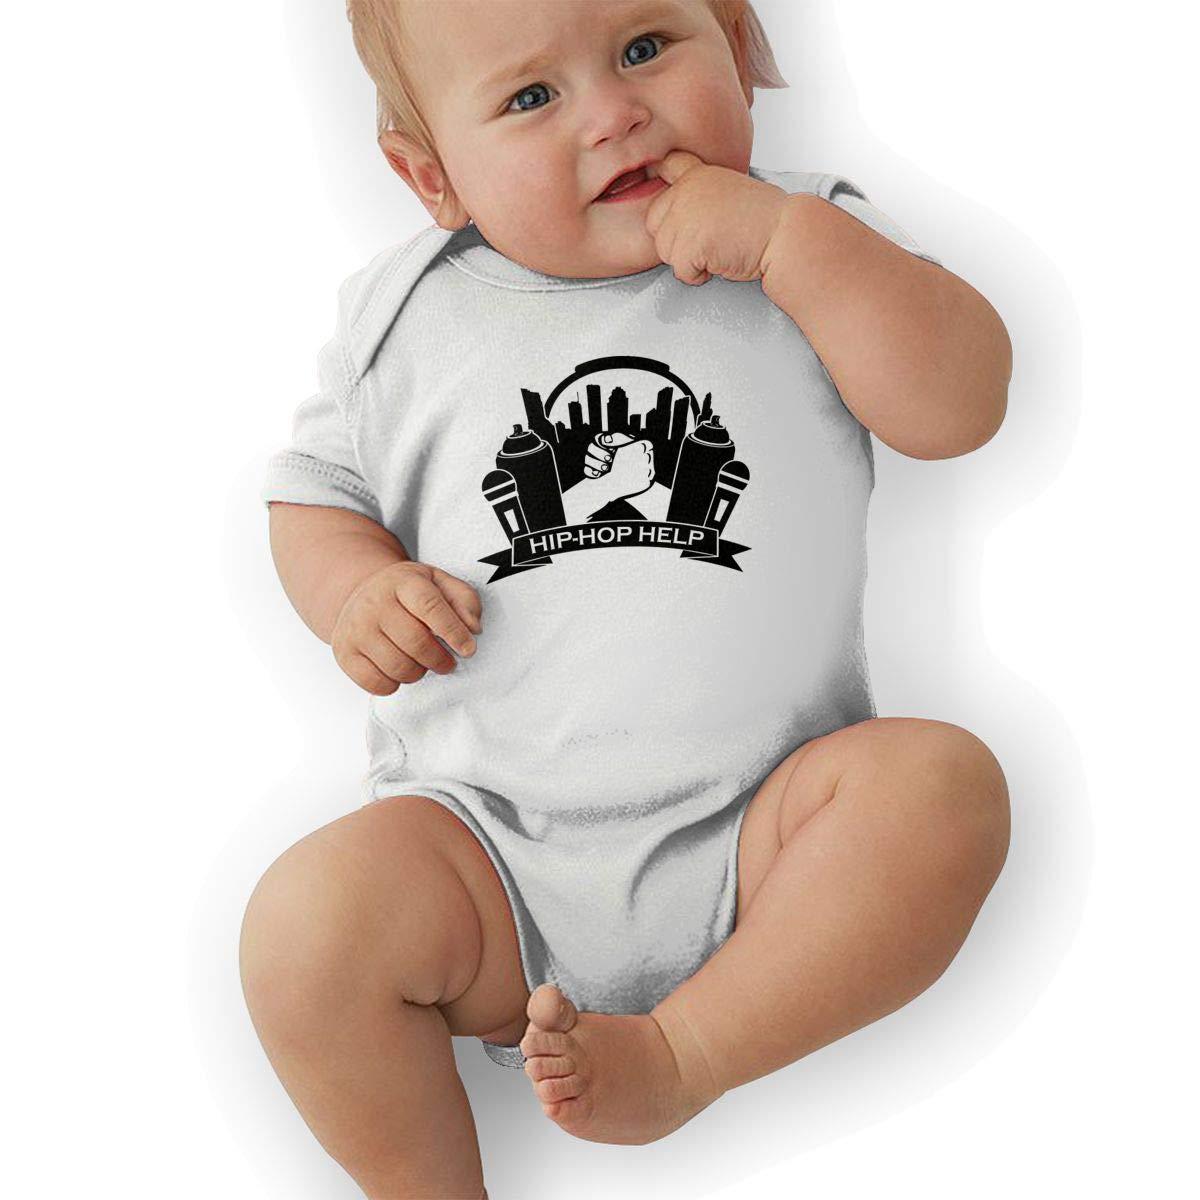 Infant Baby Boys Bodysuit Short-Sleeve Onesie Hip-Hop Help Print Jumpsuit Winter Pajamas